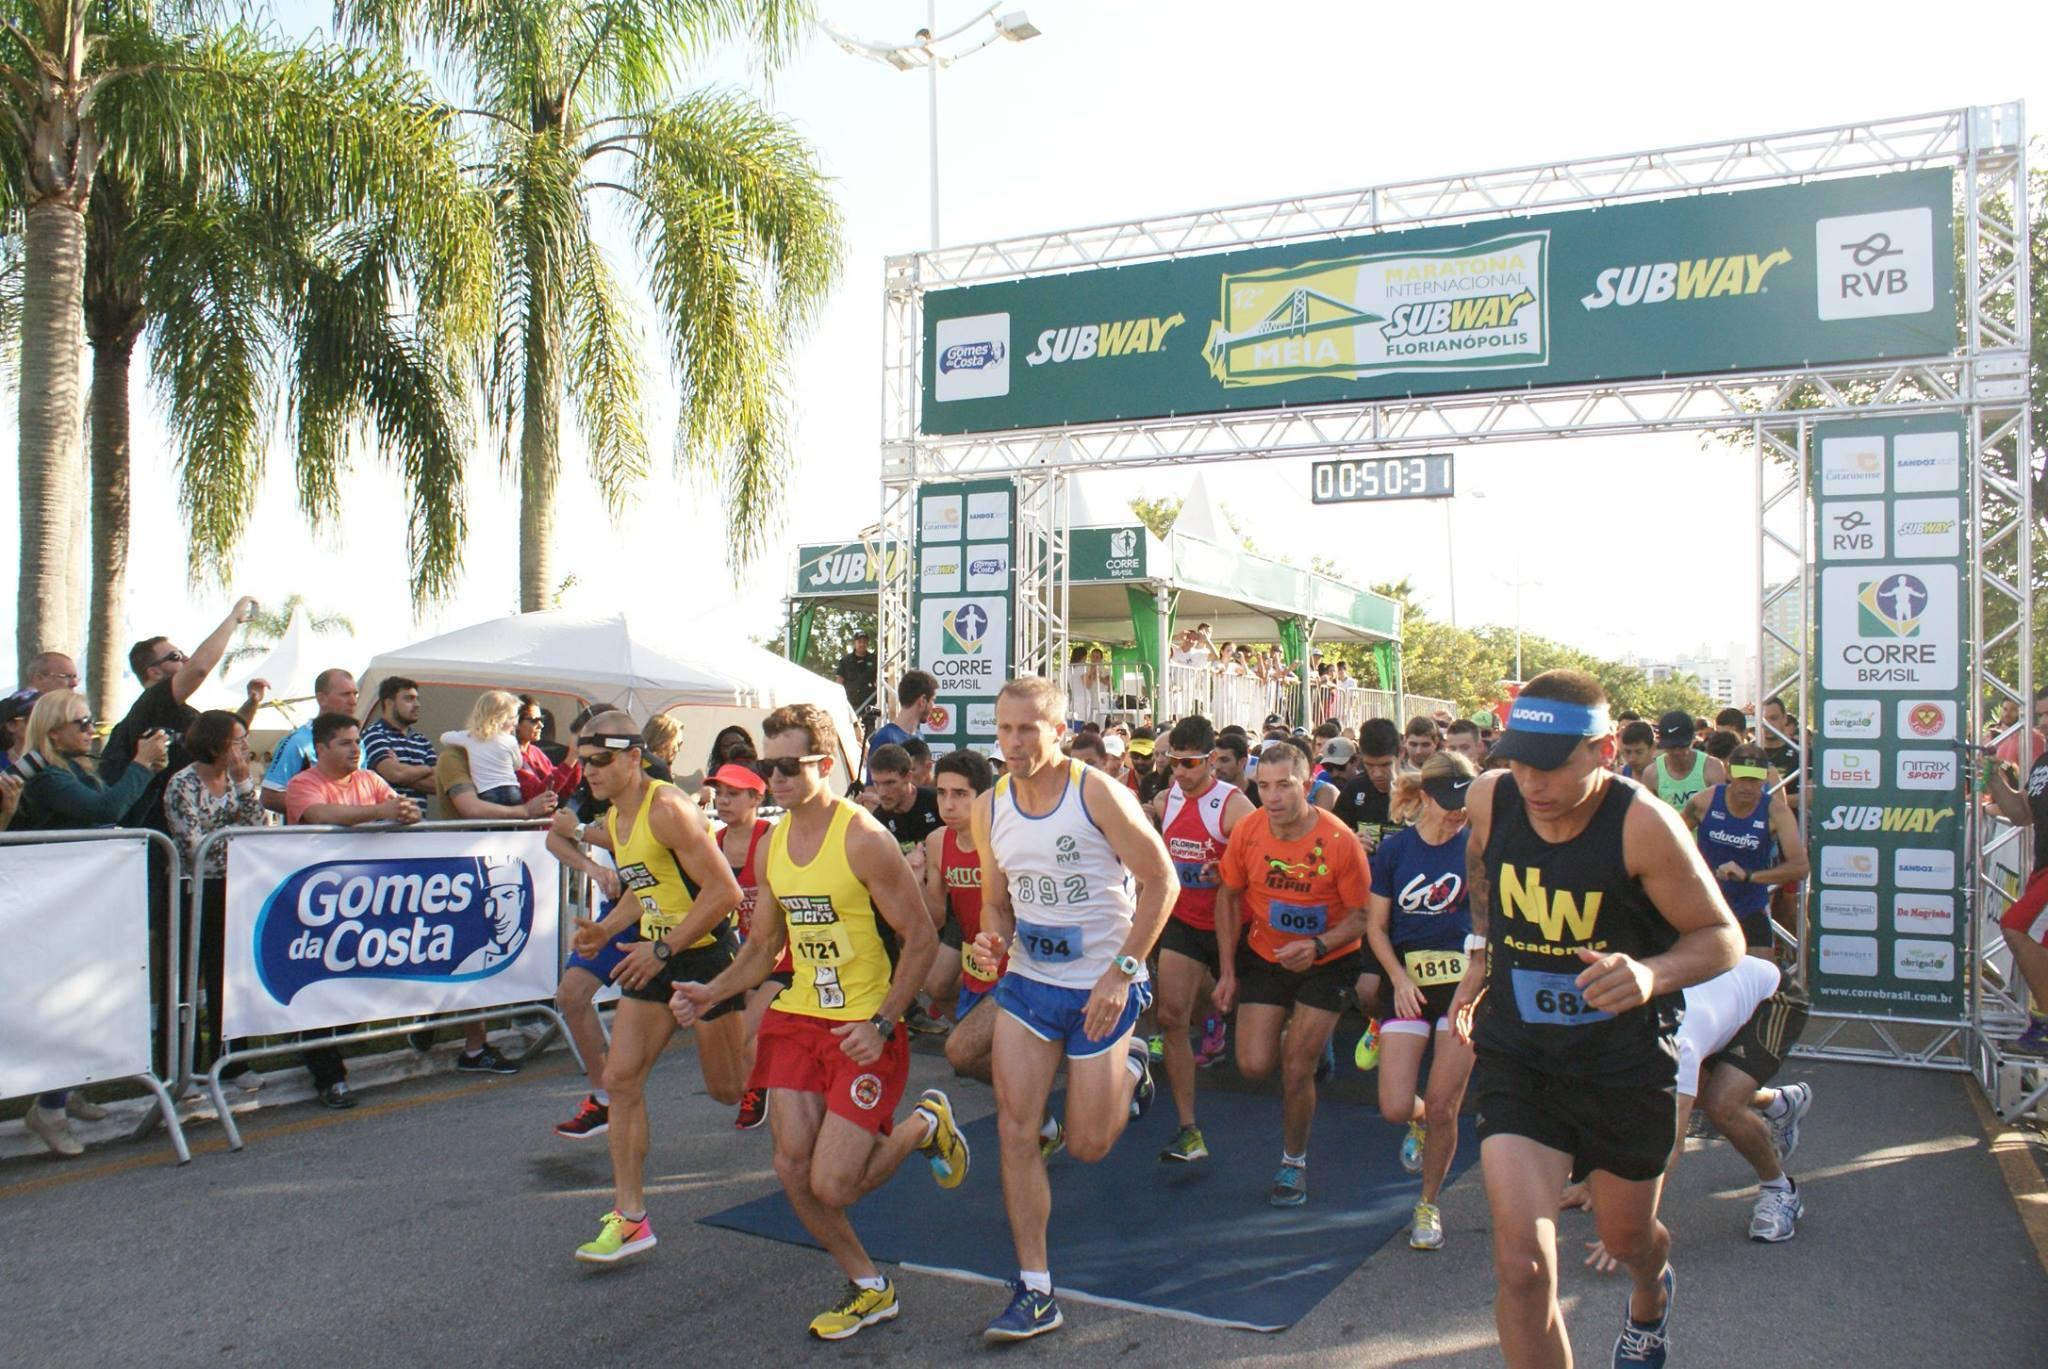 Meia Maratona Internacional de Florianópolis acontece neste domingo (19)